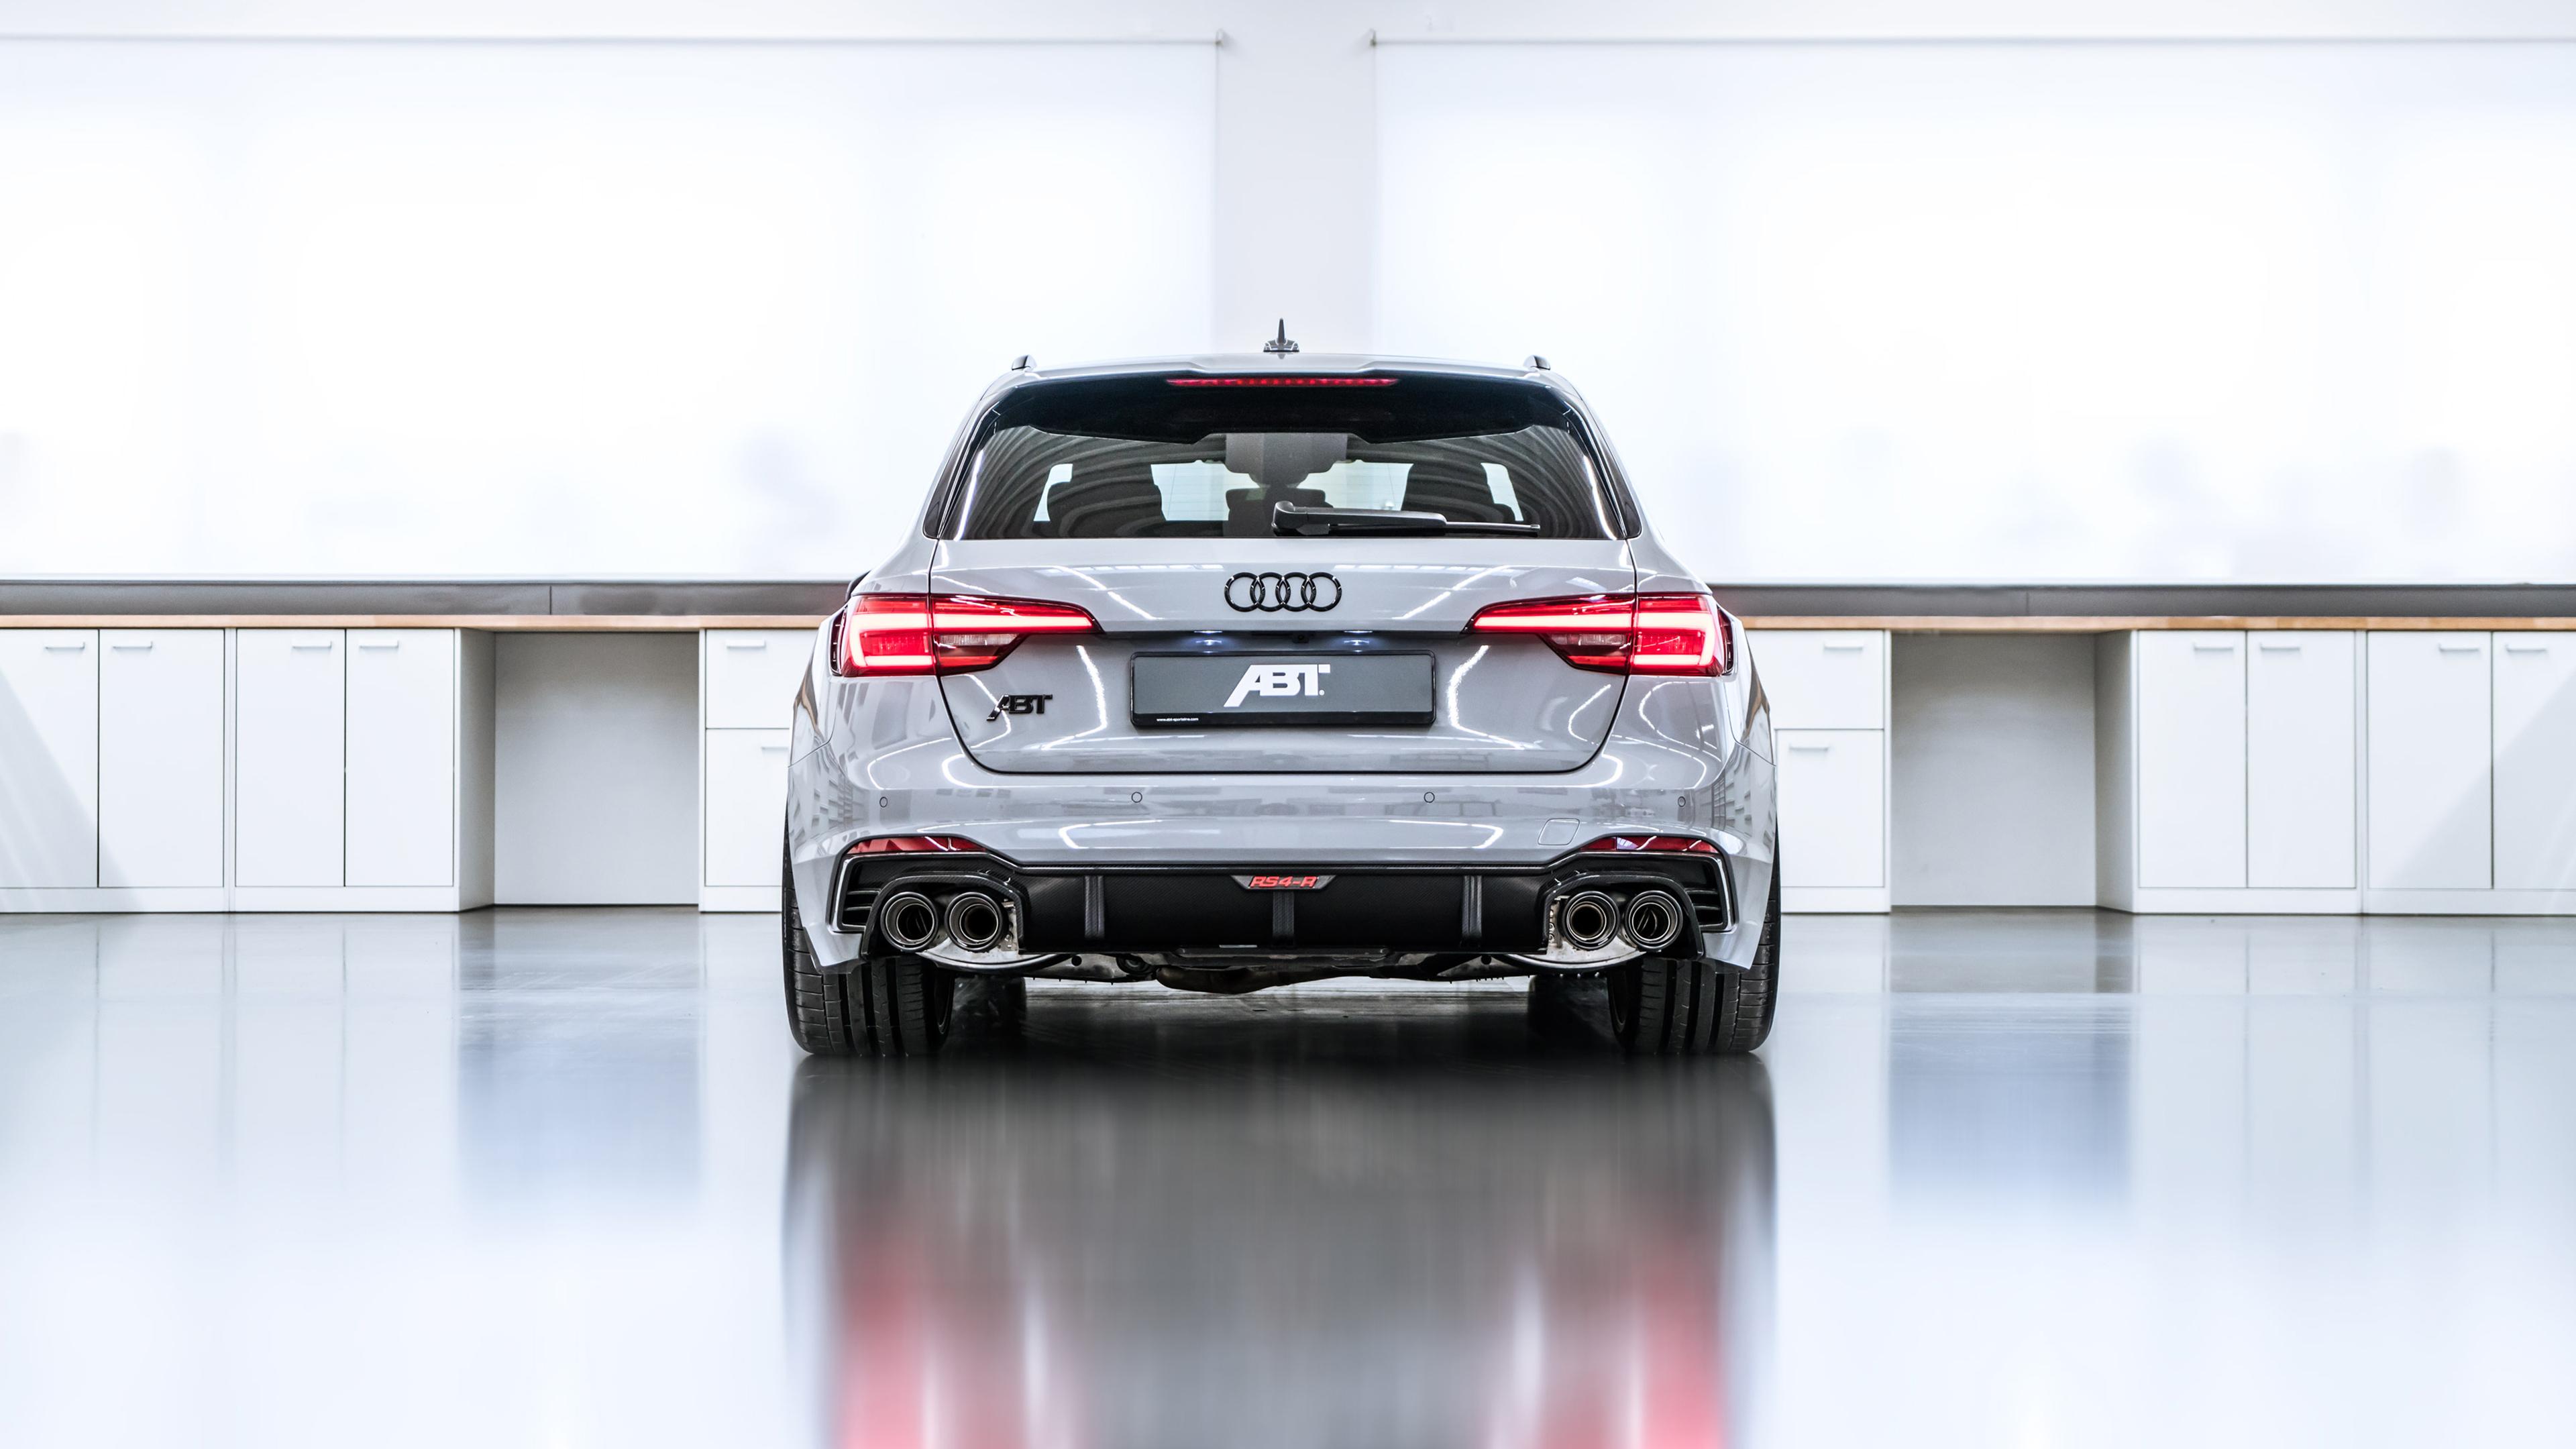 2018 Abt Audi Rs4 R Avant 4k 3 Wallpaper Hd Car Wallpapers